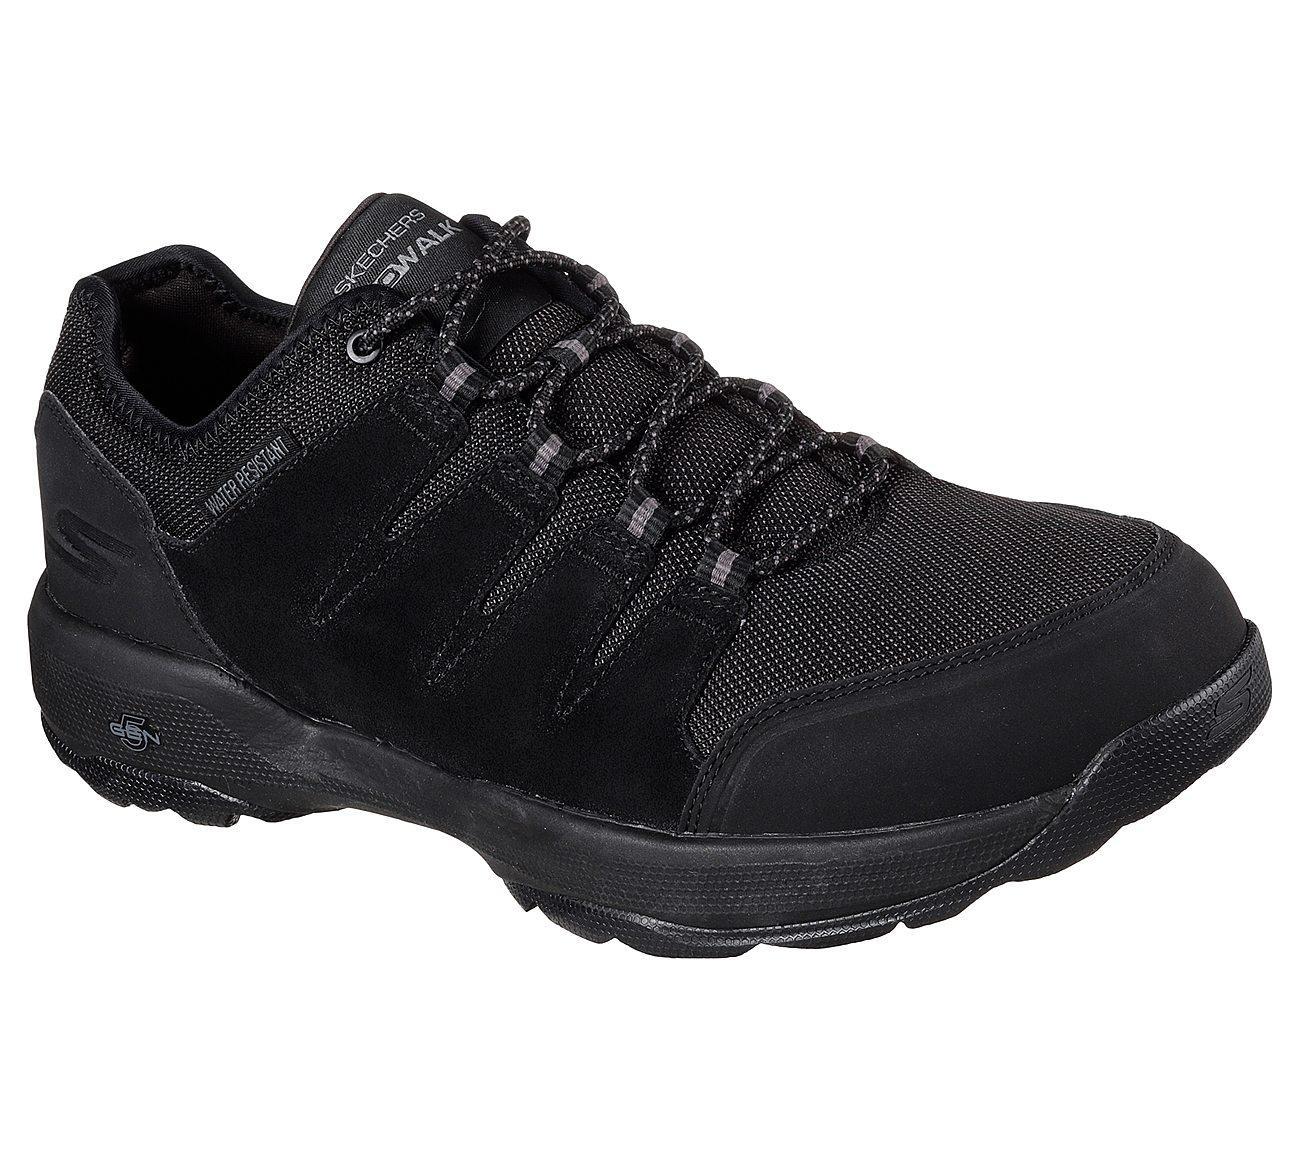 Skechers - Skechers GOwalk Outdoors 2 Sepatu Snekaers Pria - Hitam 907899f090